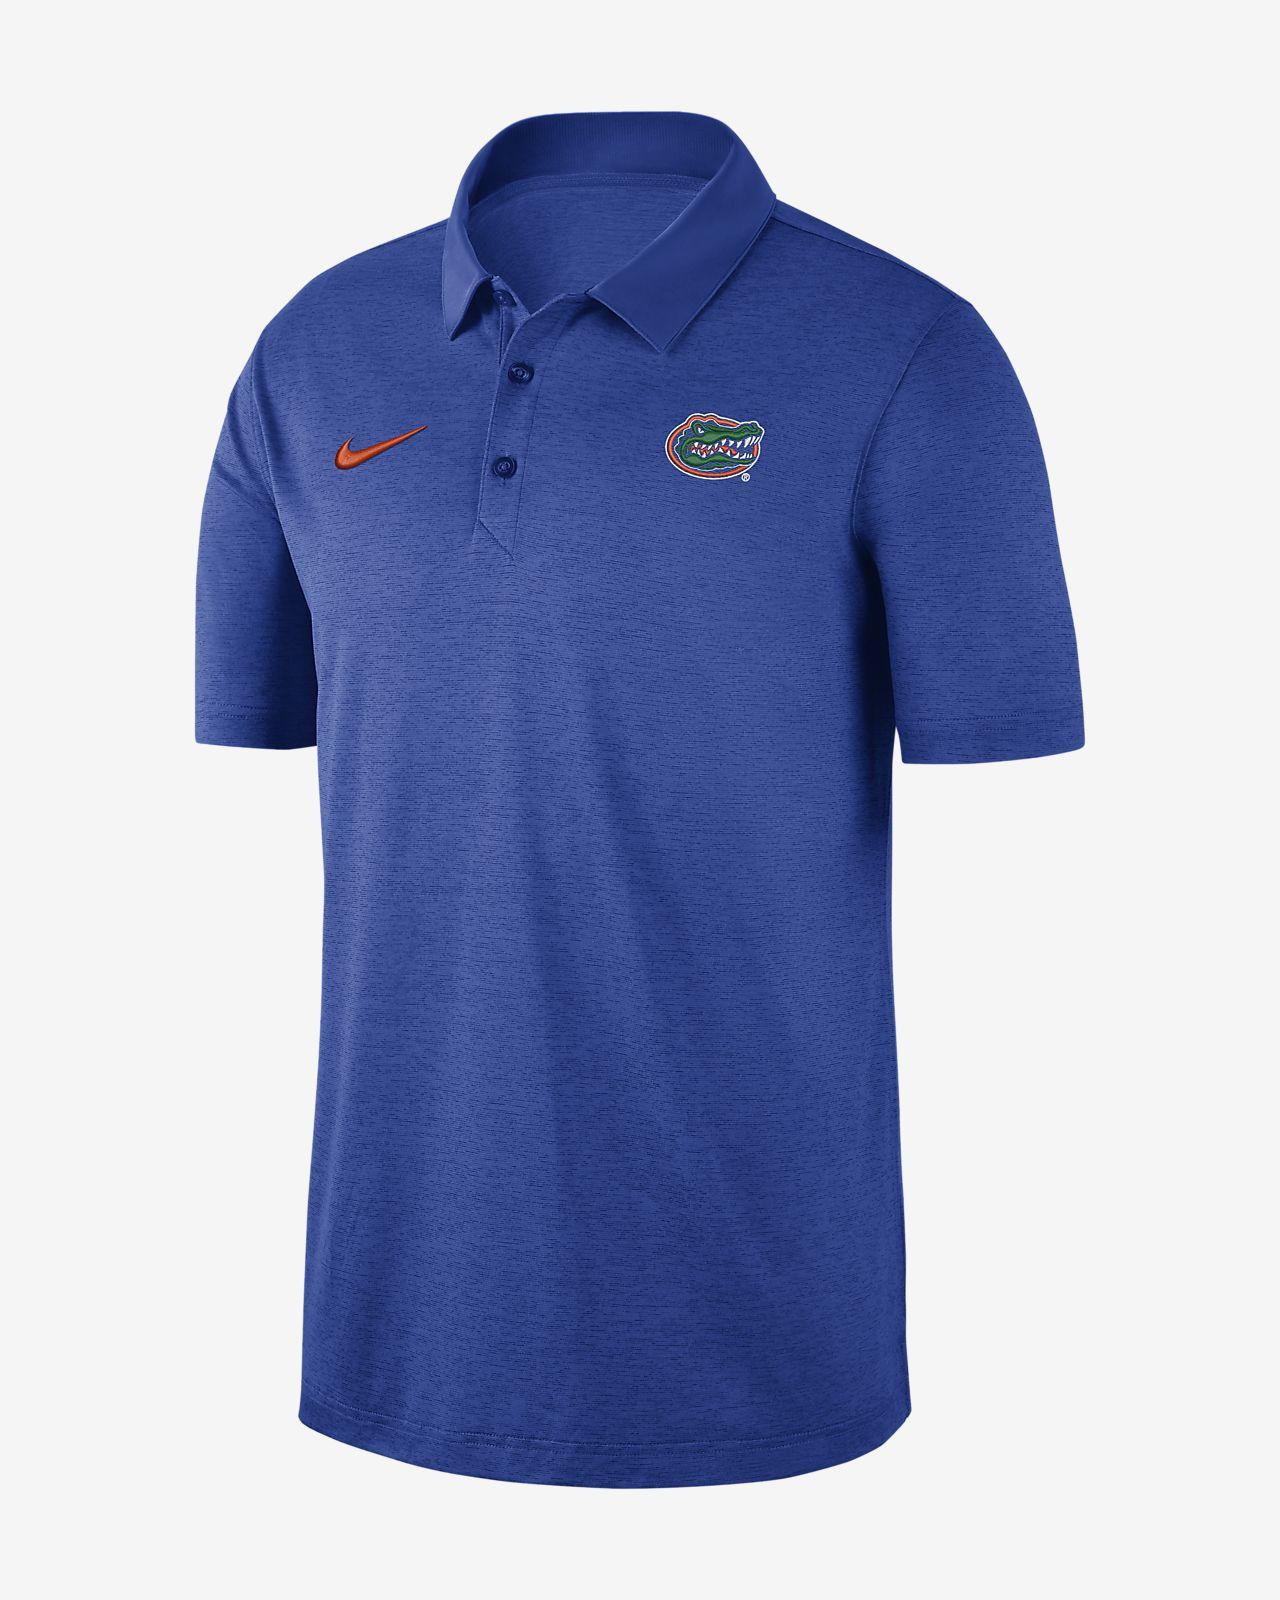 Nike College Dri-FIT (Florida) Men's Polo